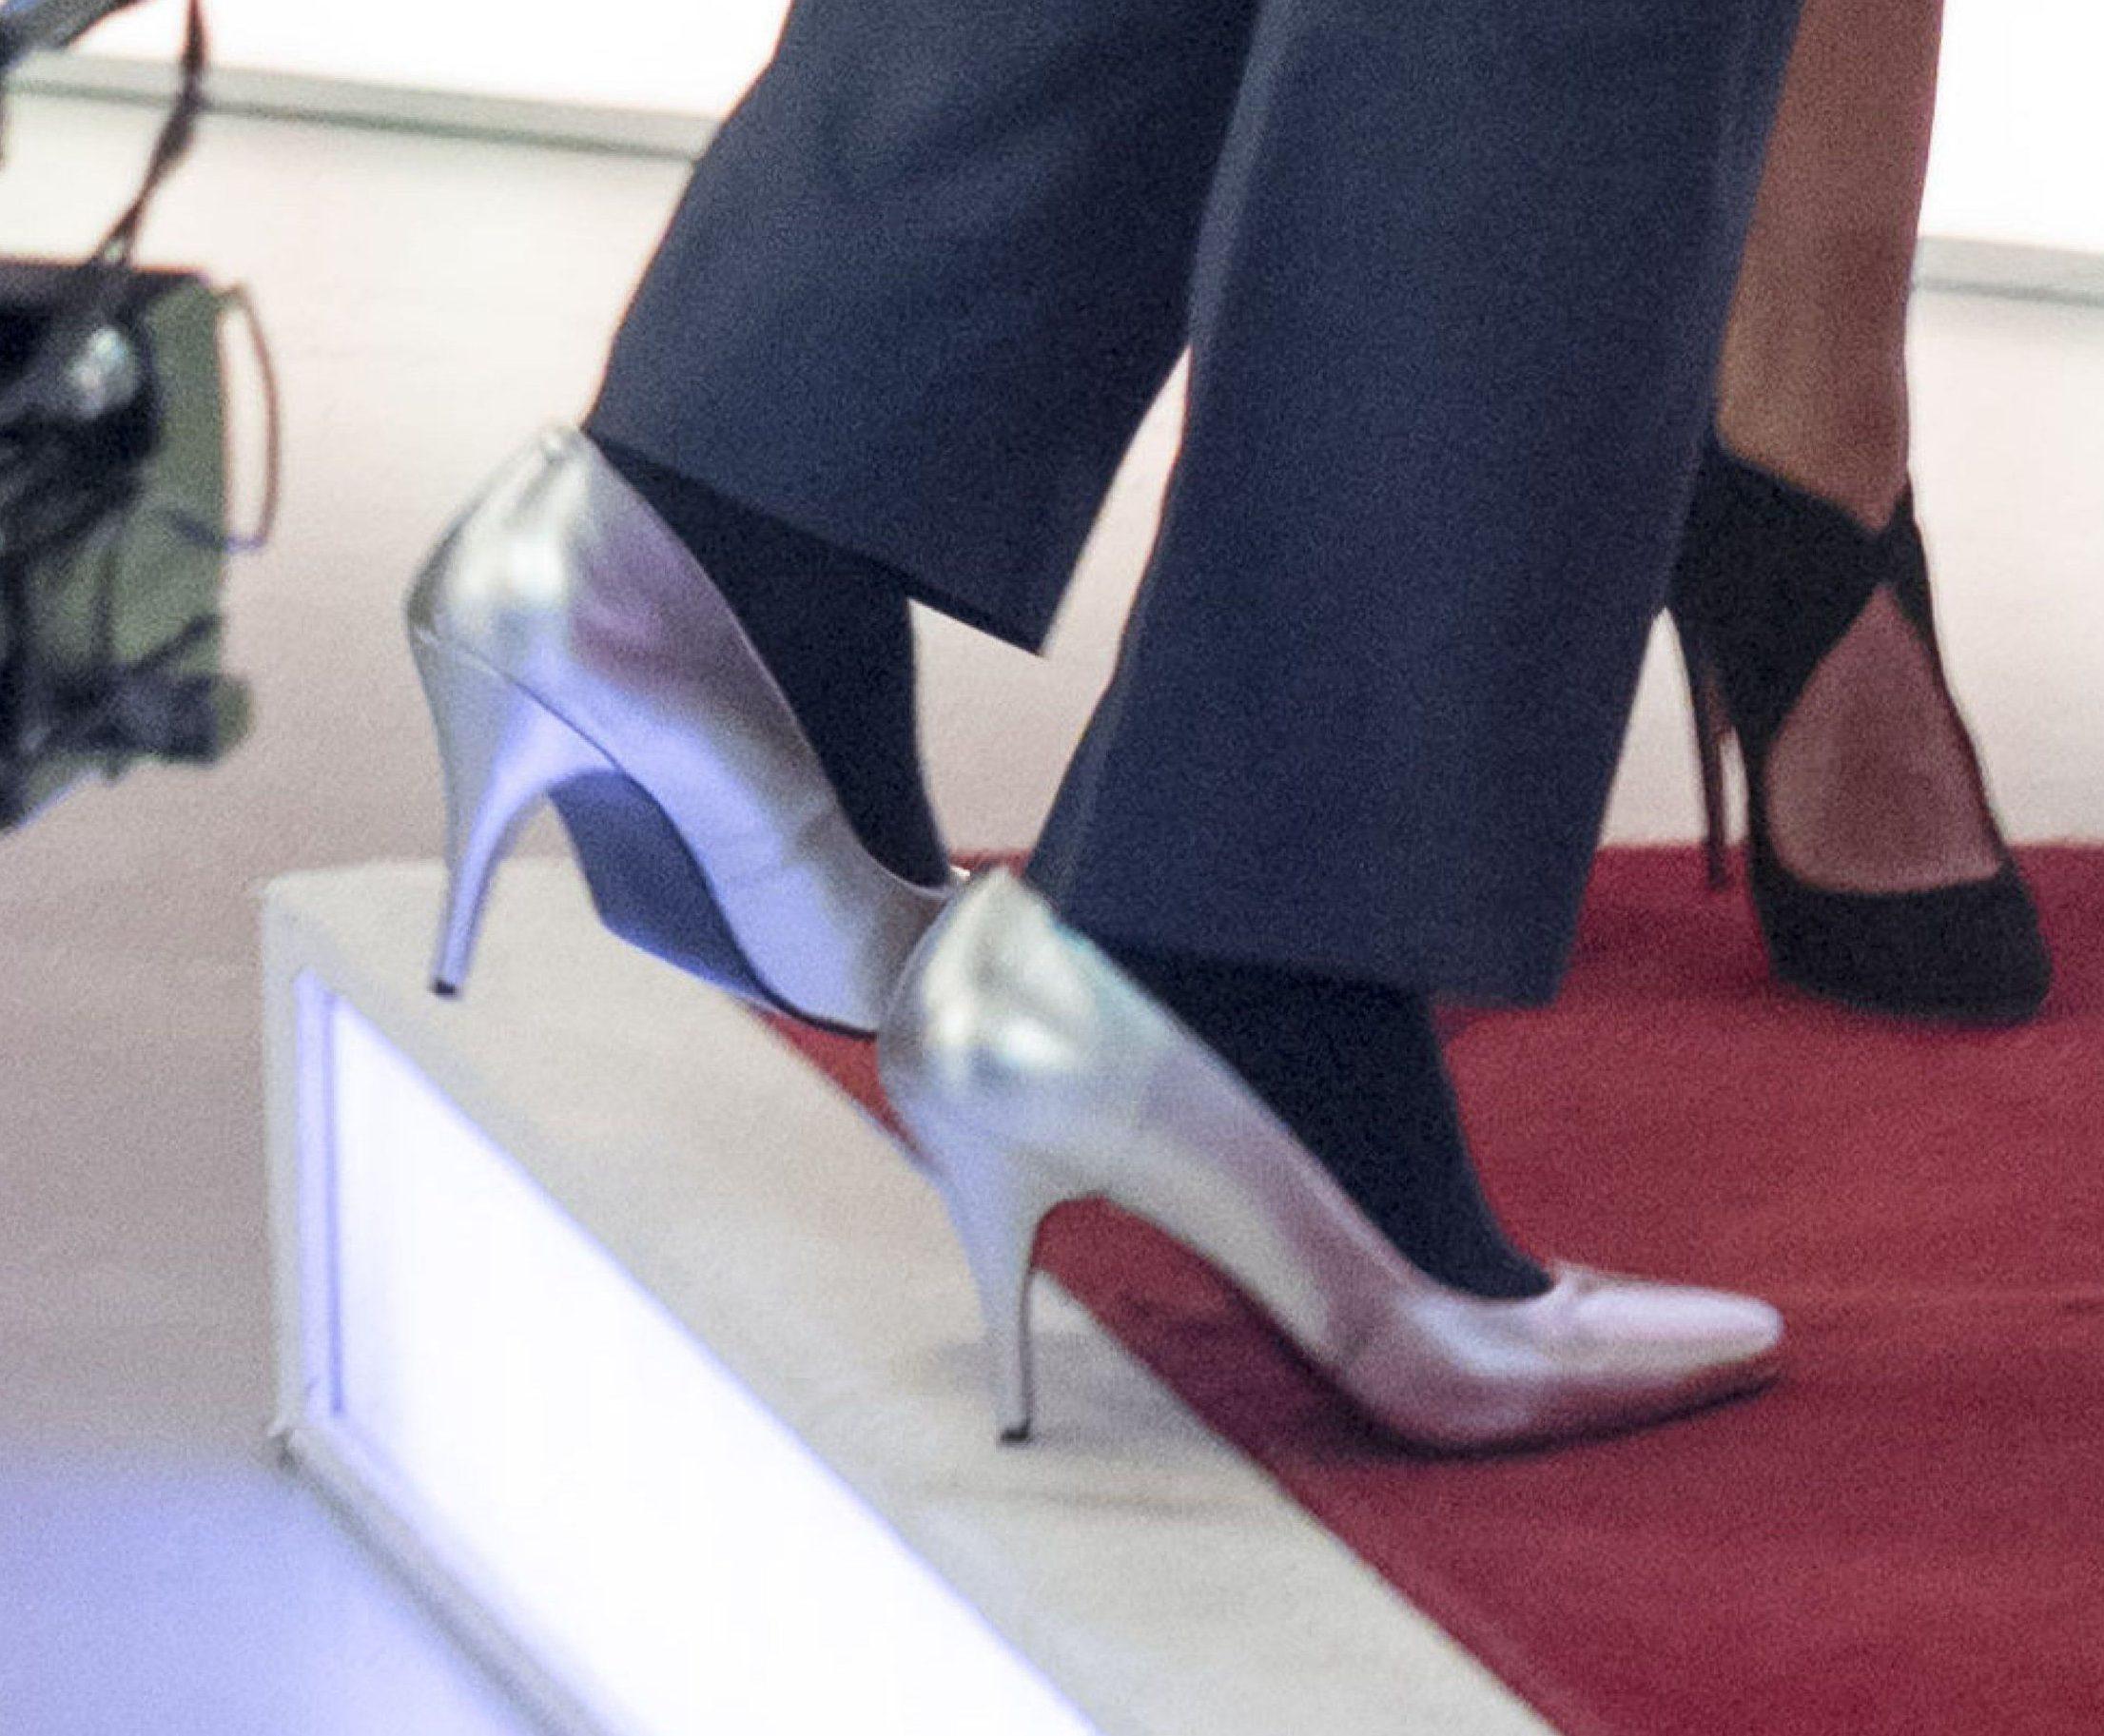 EDITORIAL USE ONLY. NO MERCHANDISING Mandatory Credit: Photo by Ken McKay/ITV/REX/Shutterstock (8154776ae) Piers Morgan wearing high heels 'Loose Women' TV show, London, UK - 30 Jan 2017